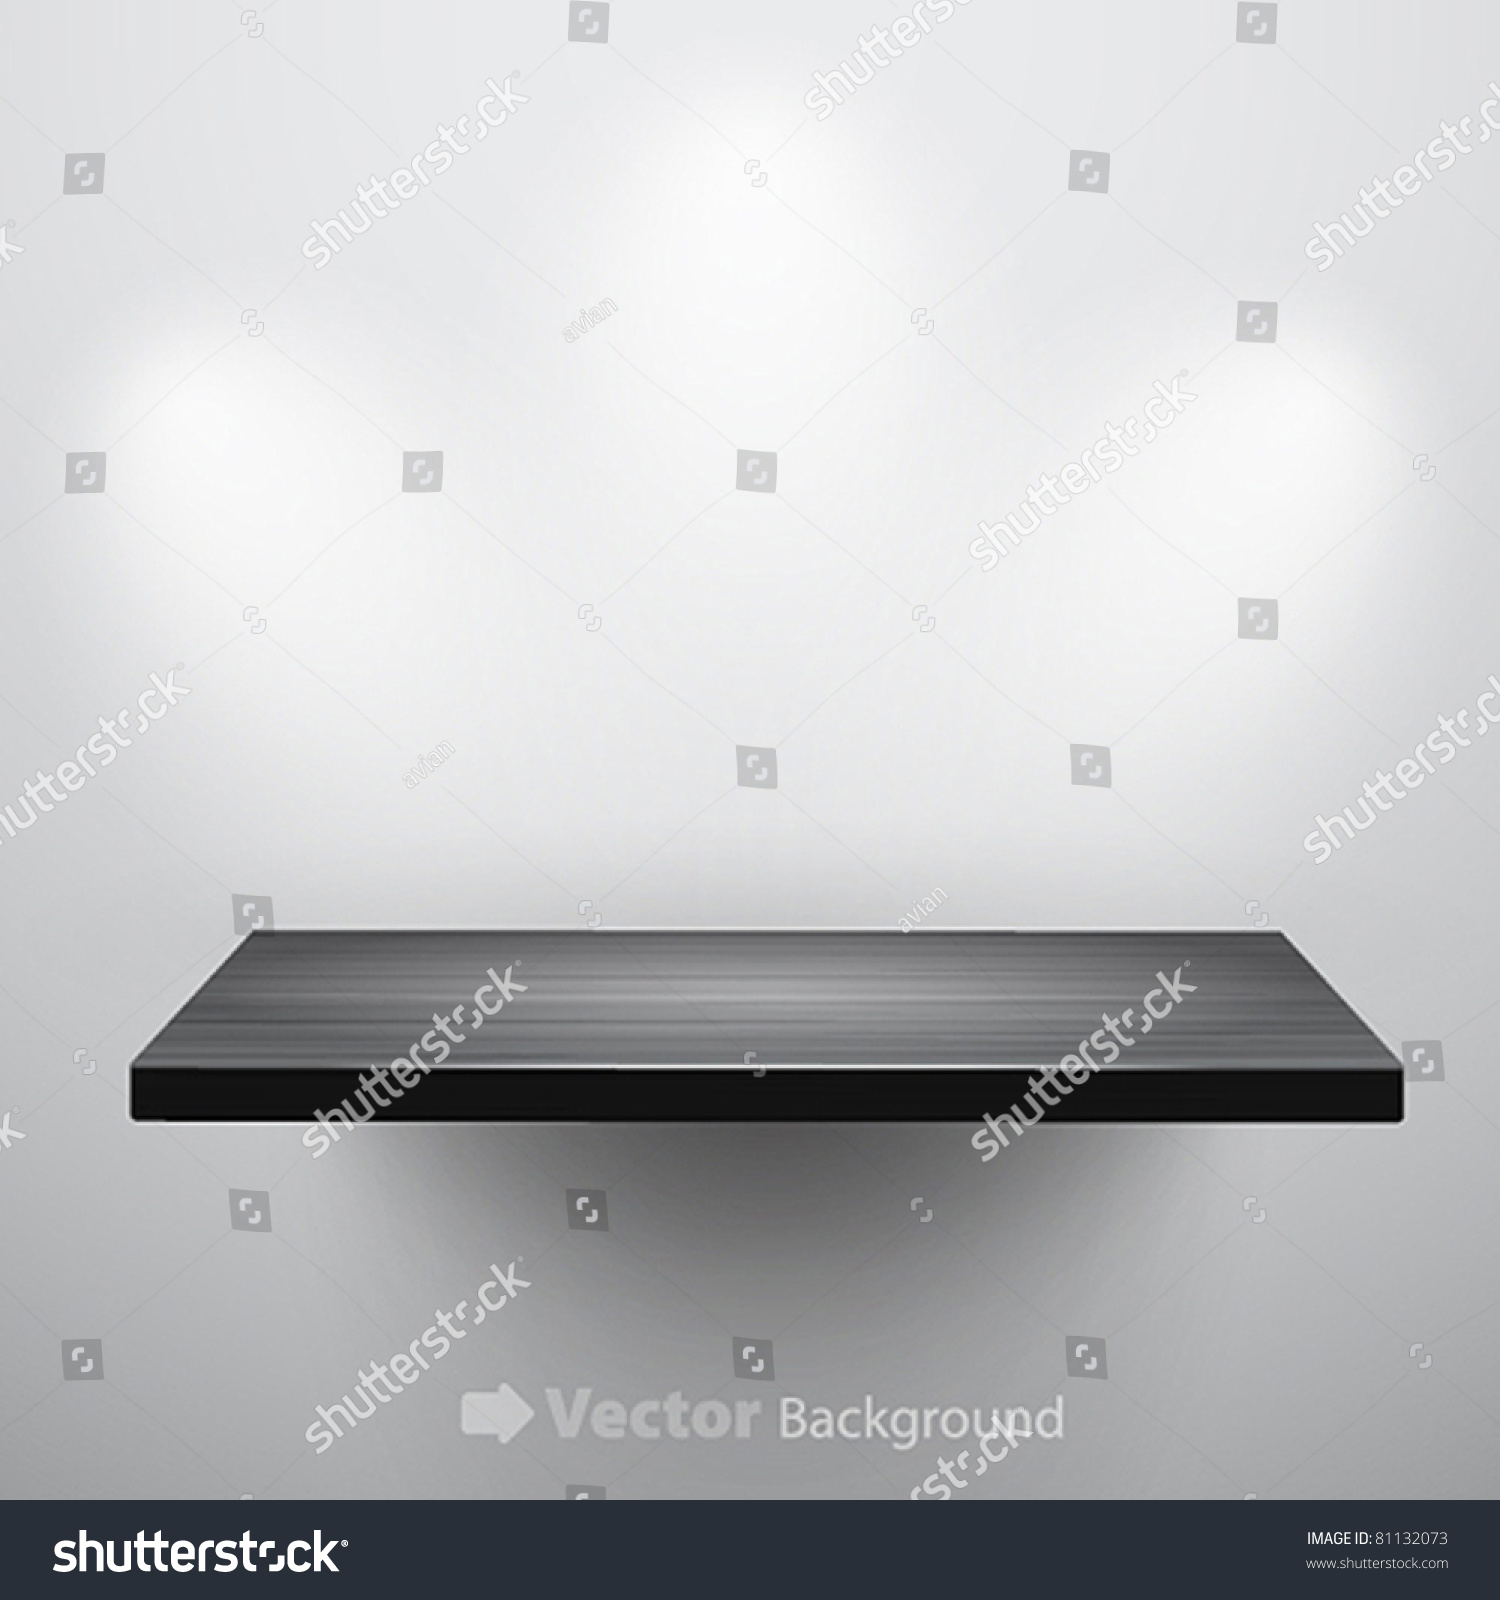 Exhibition D Vector : D isolated empty shelf for exhibit vector illustration